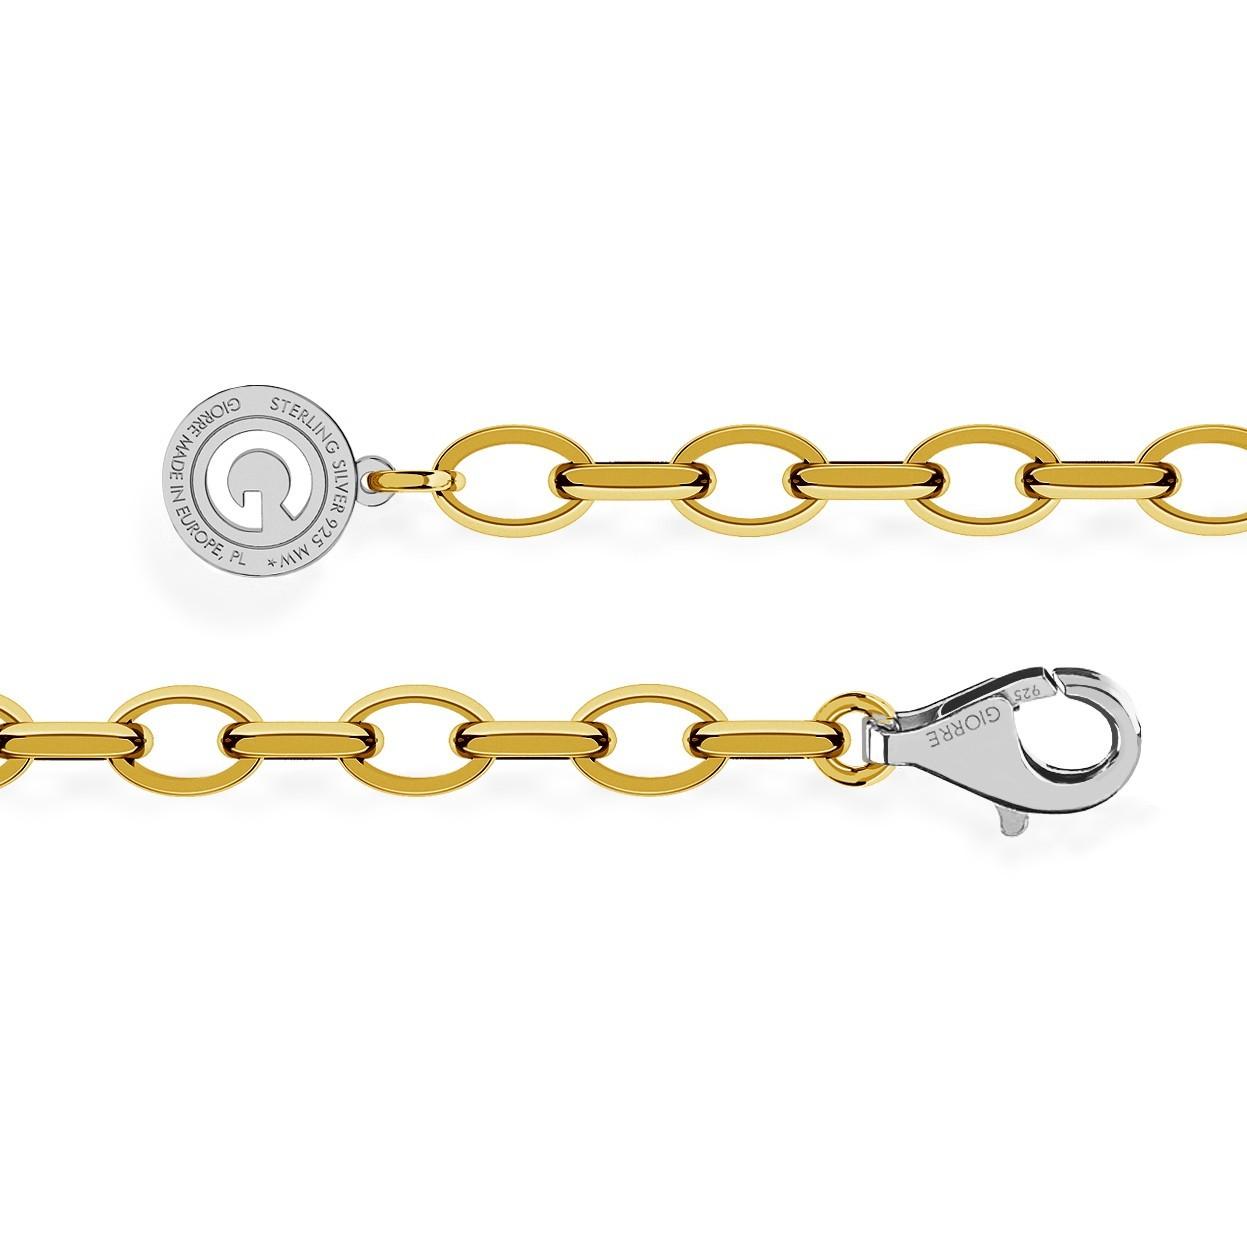 STERLING SILVER BRACELET 16-24 CM YELLOW GOLD, LIGHT RHODIUM CLASP, LINK 7X5 MM